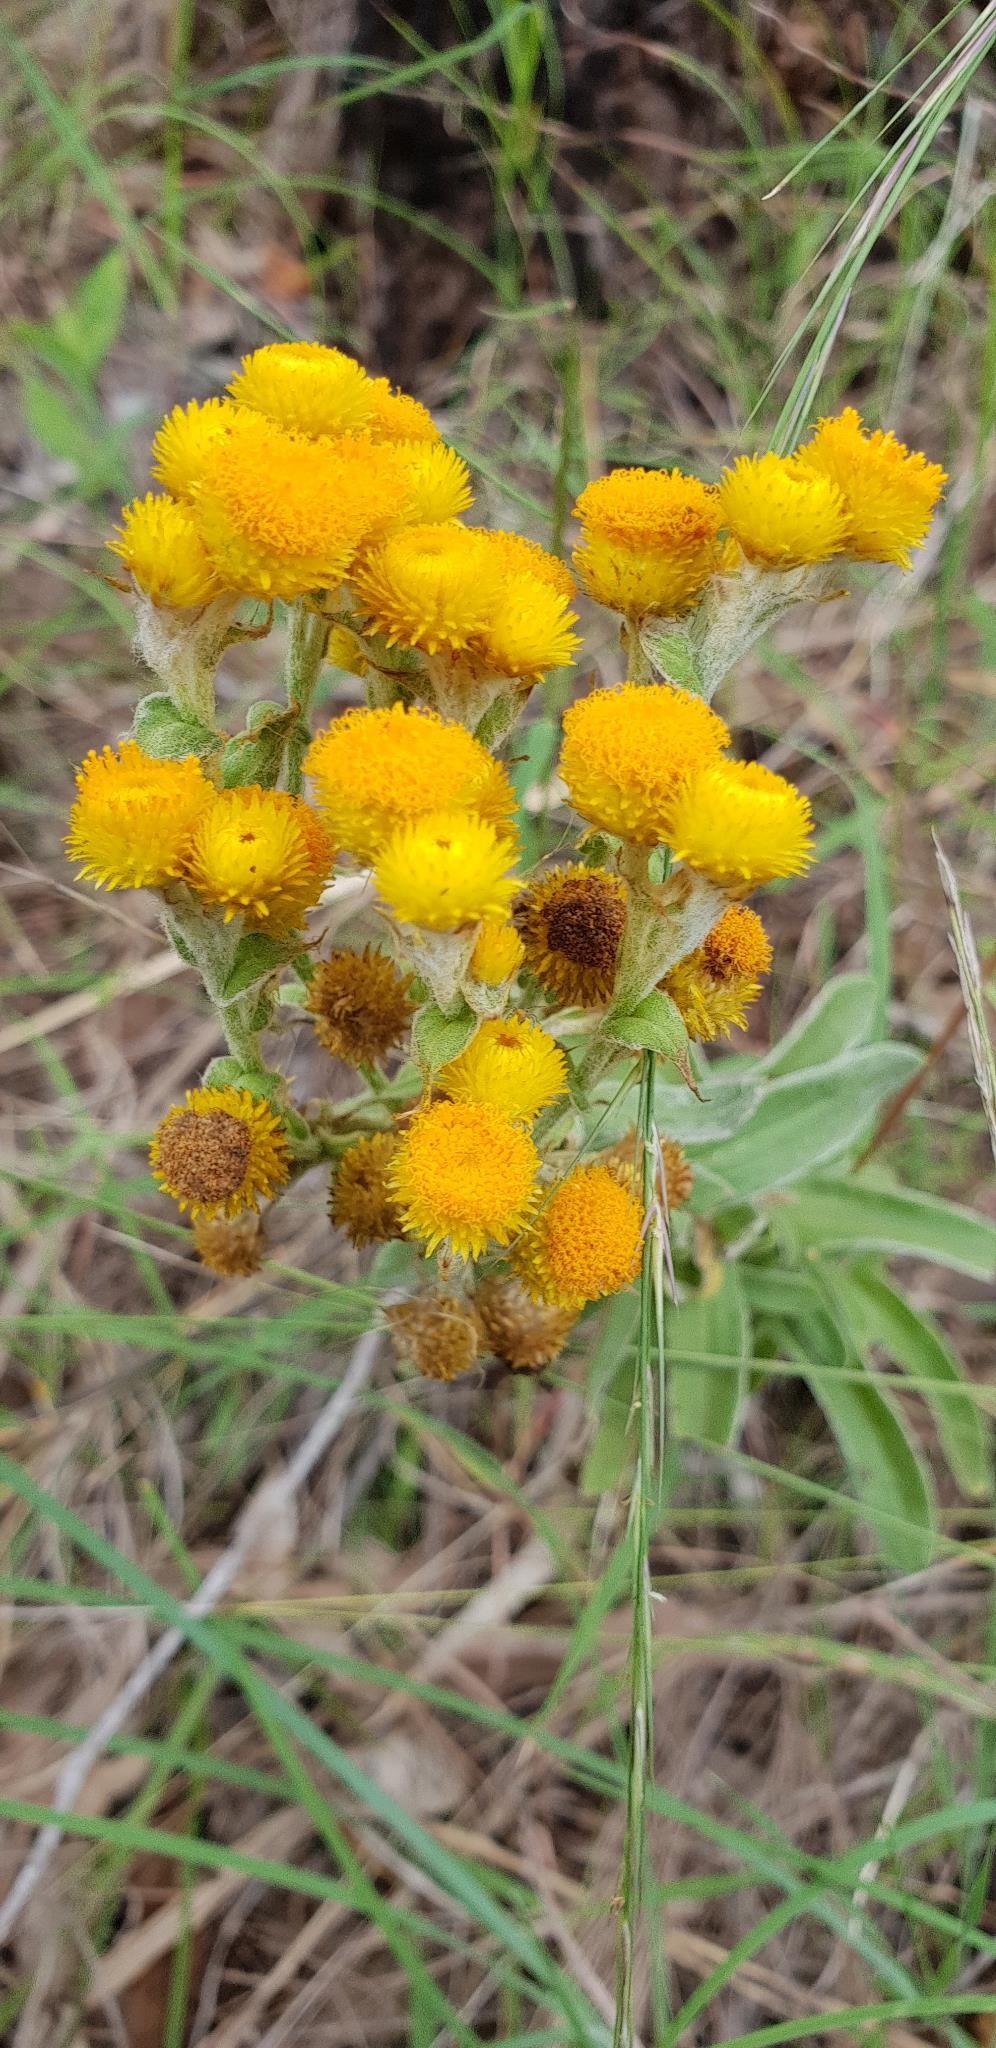 Yellow buttons - Chrysocephalum apiculatum